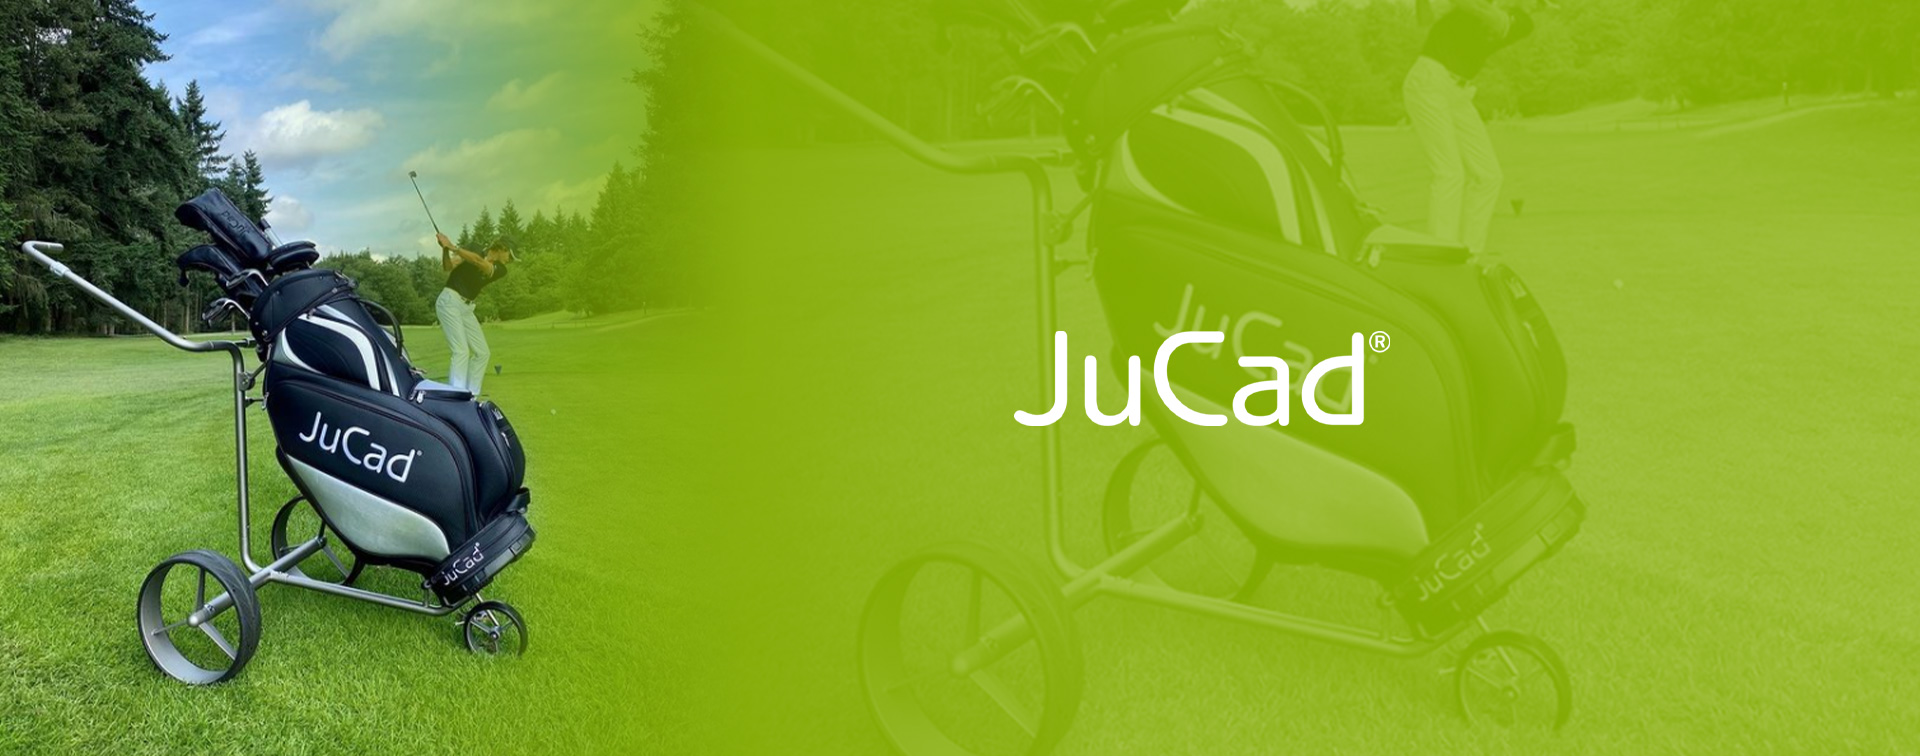 Chariots JuCad